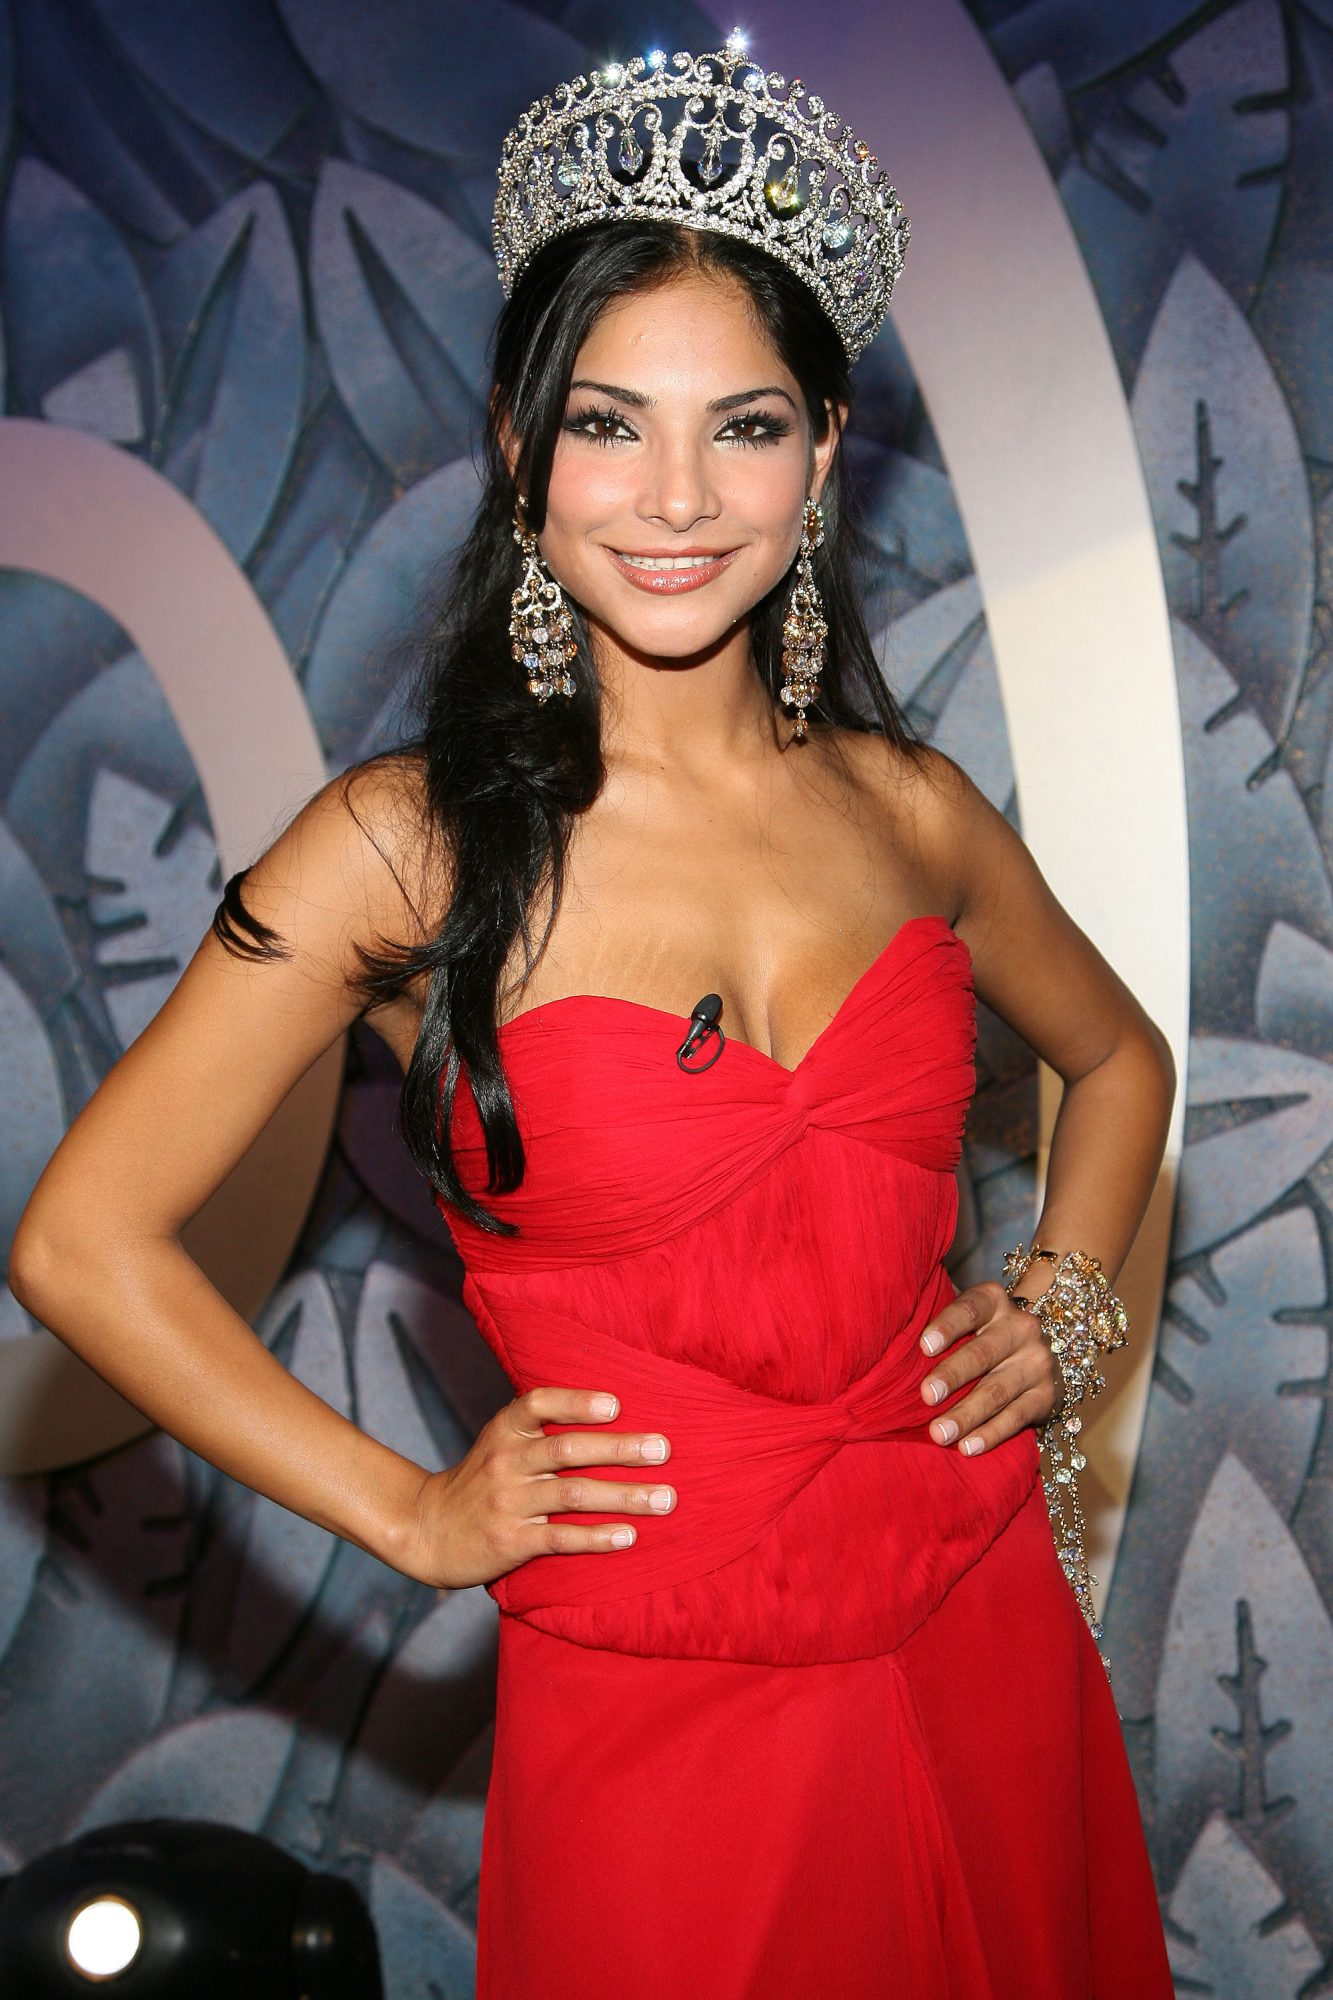 Univision's Nuestra Belleza Latina Final Episode